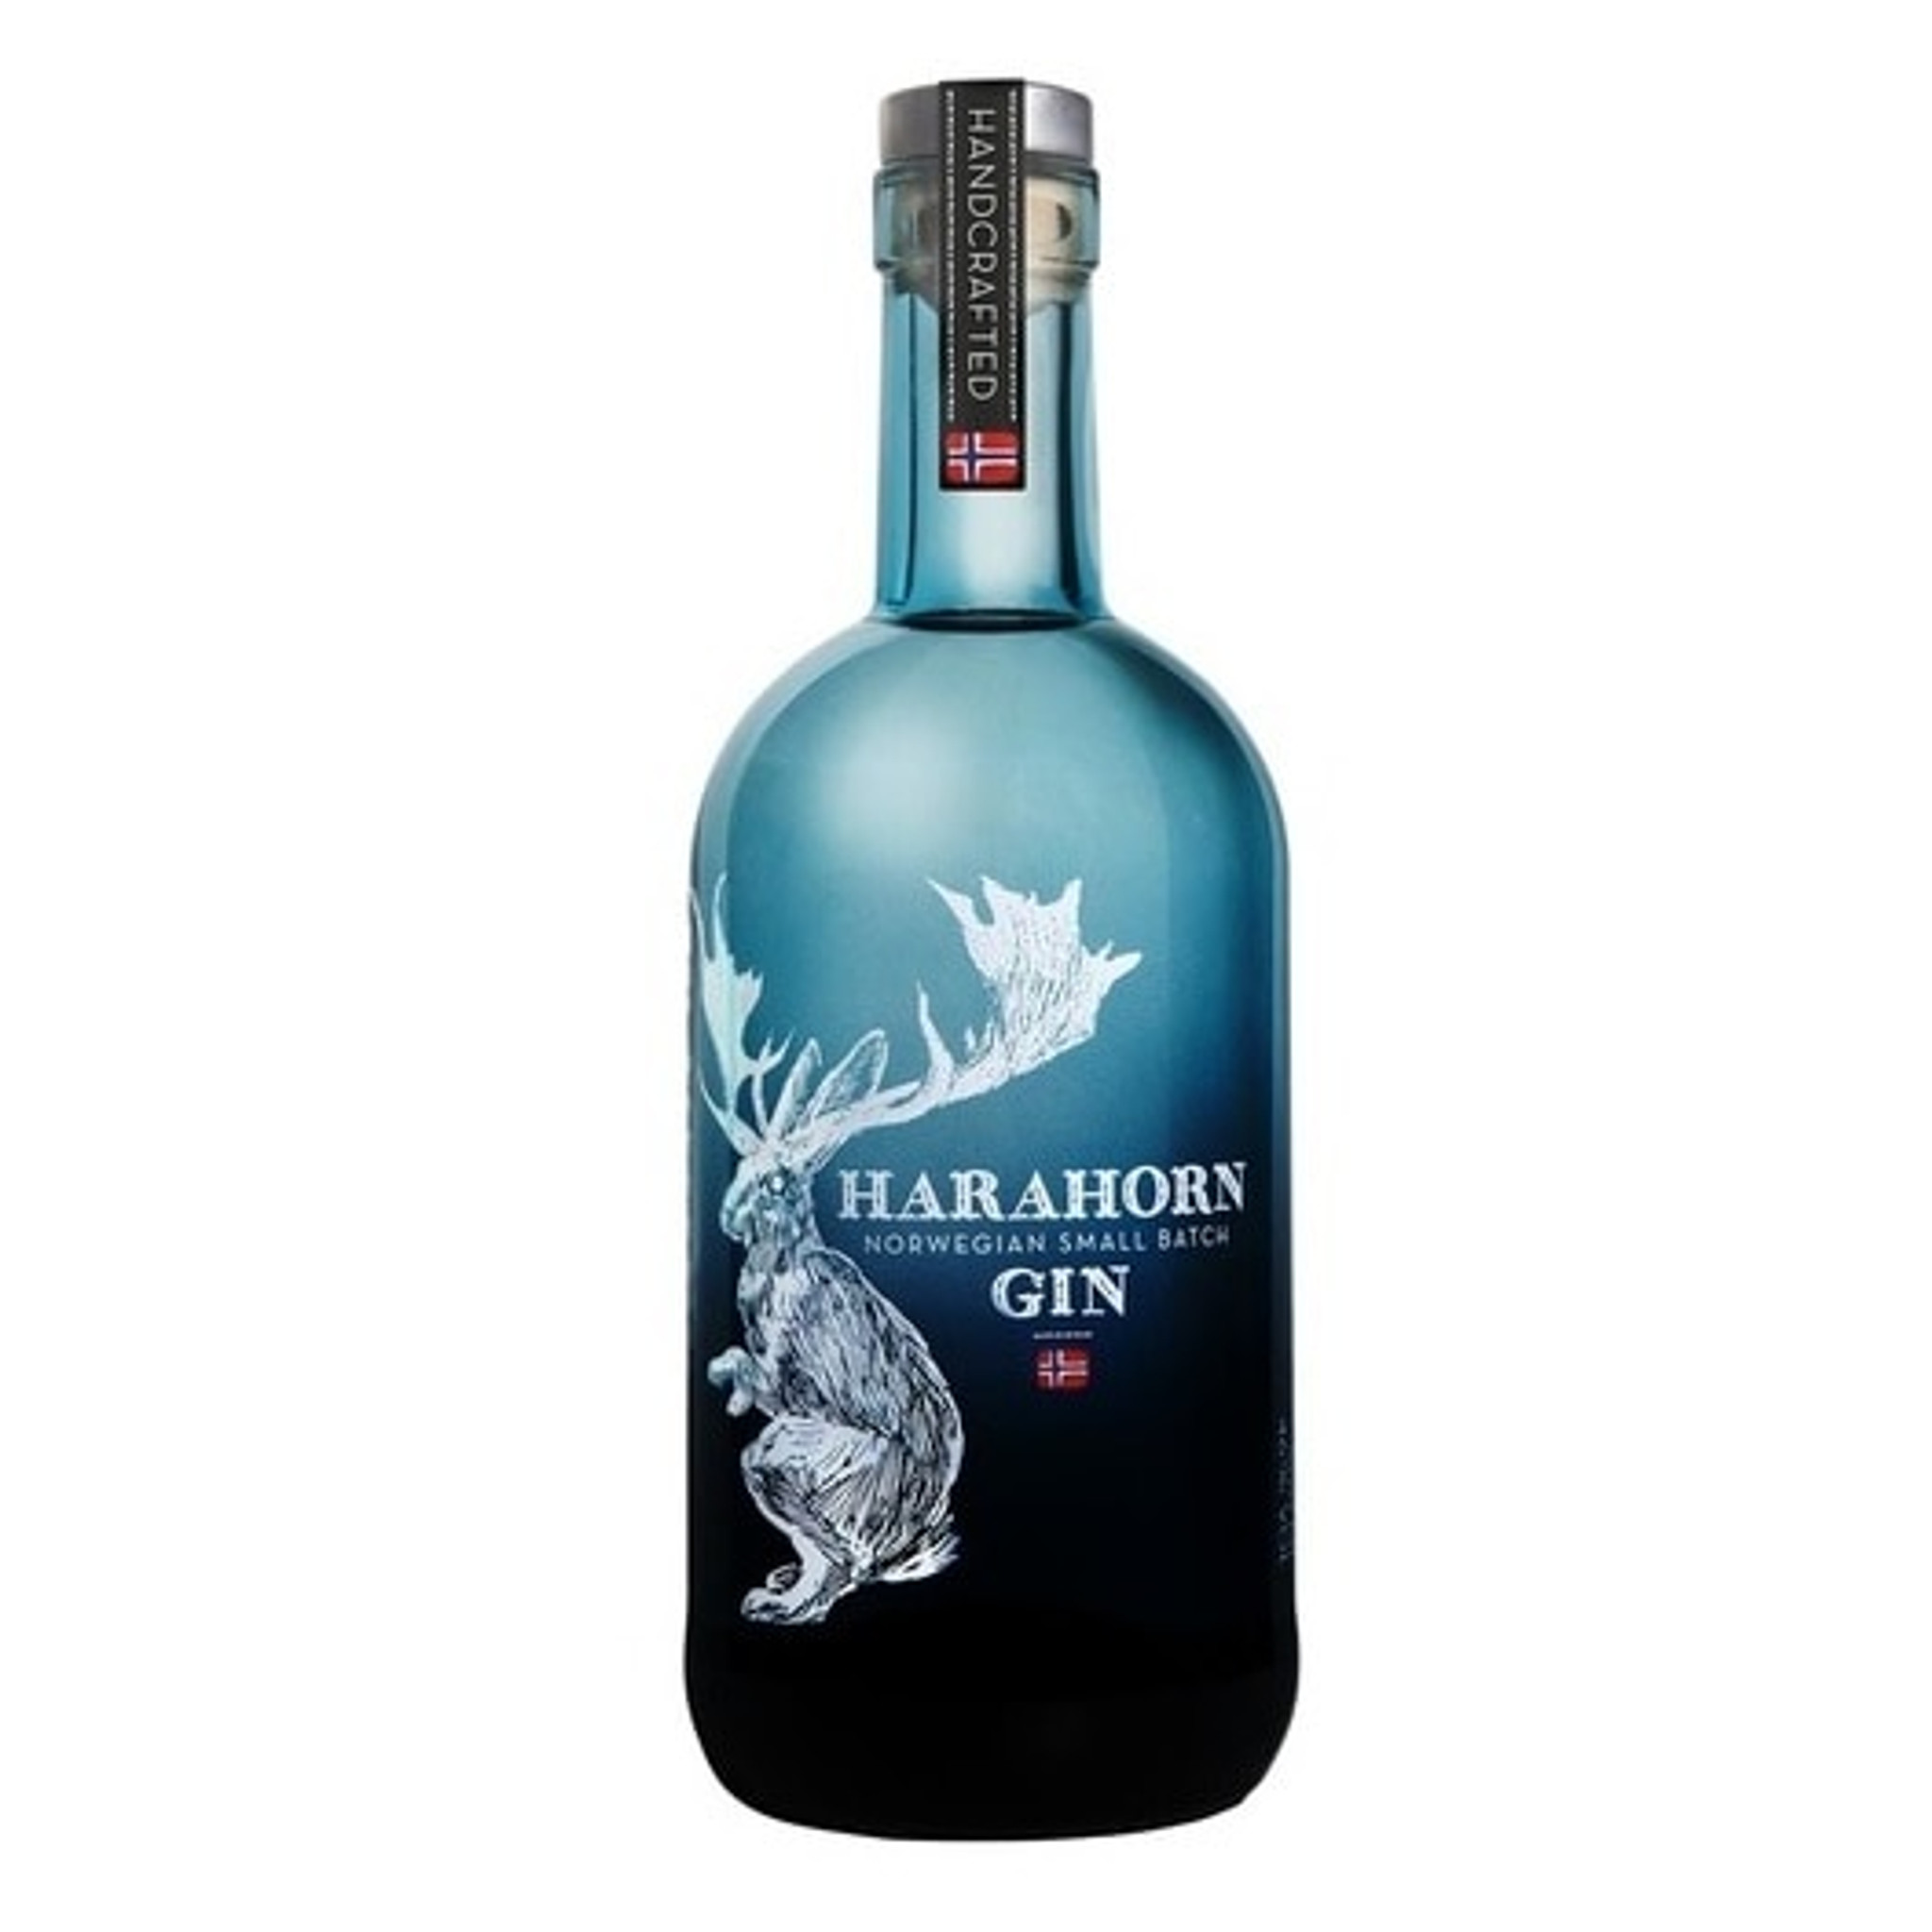 Harahorn Norwegian Small Batch Gin